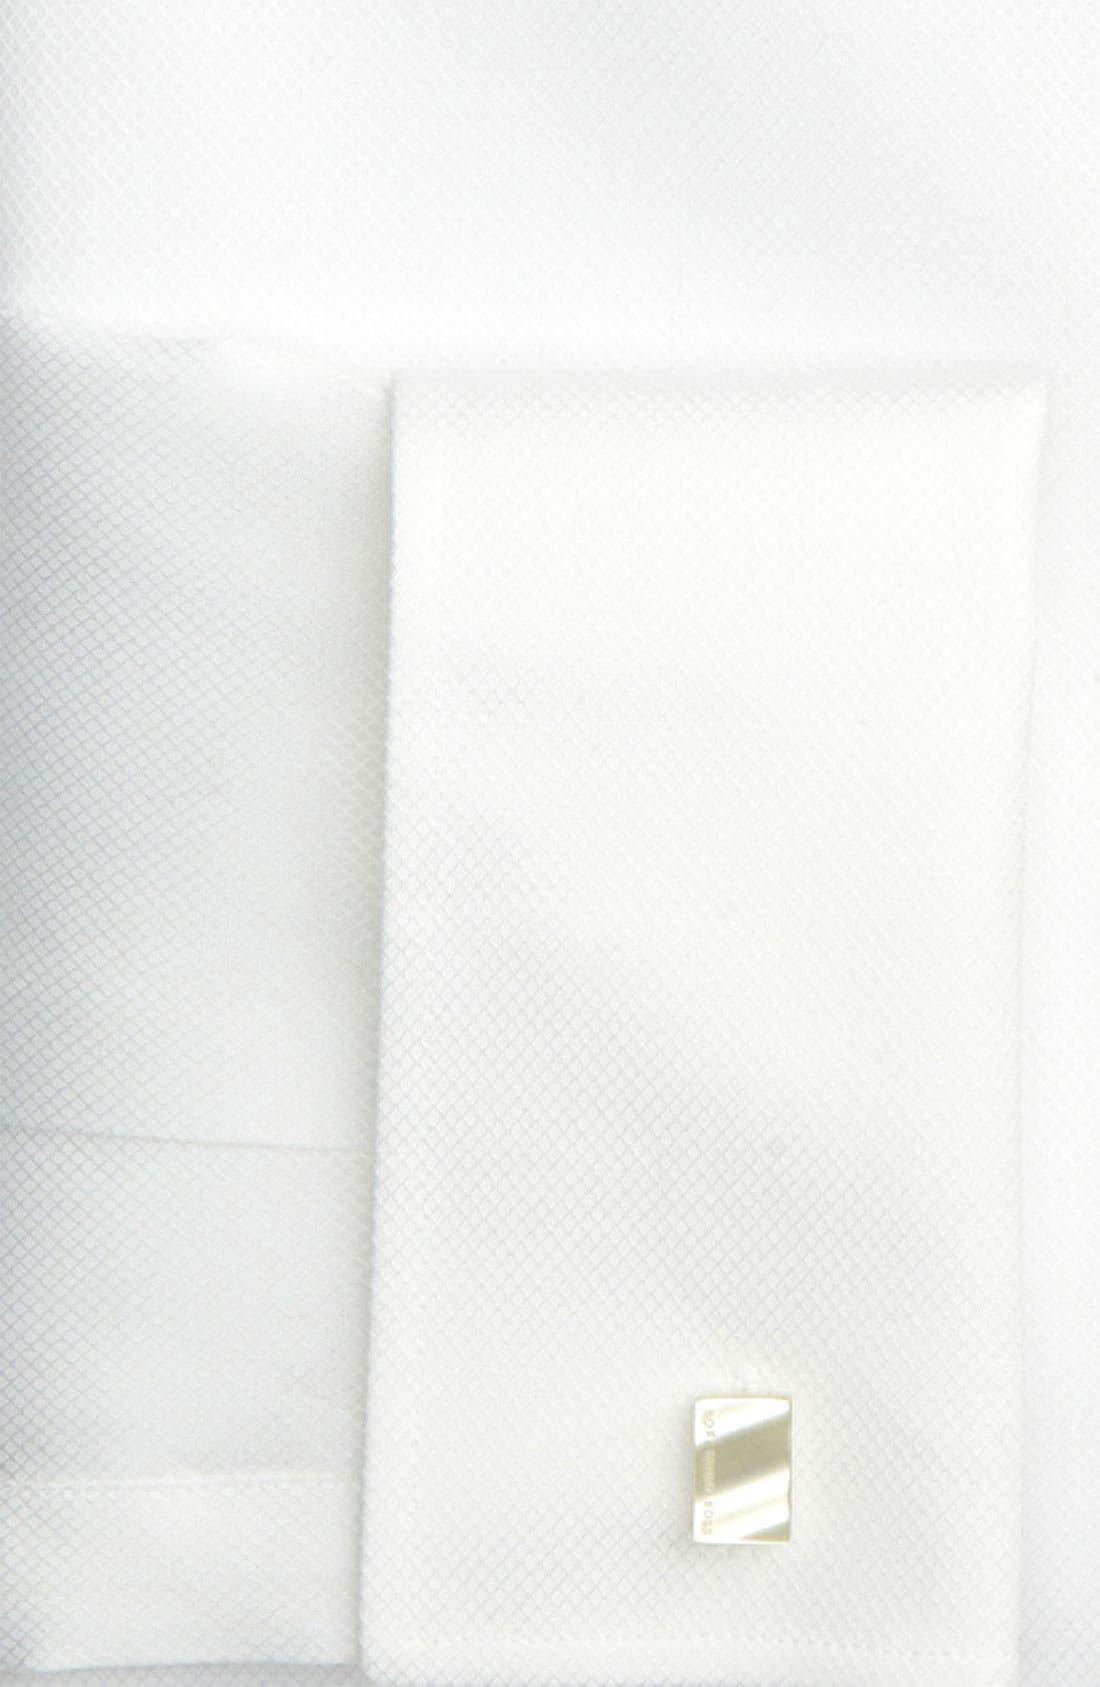 BOSS, Jameson Slim Fit Diamond Weave French Cuff Tuxedo Shirt, Alternate thumbnail 7, color, 120